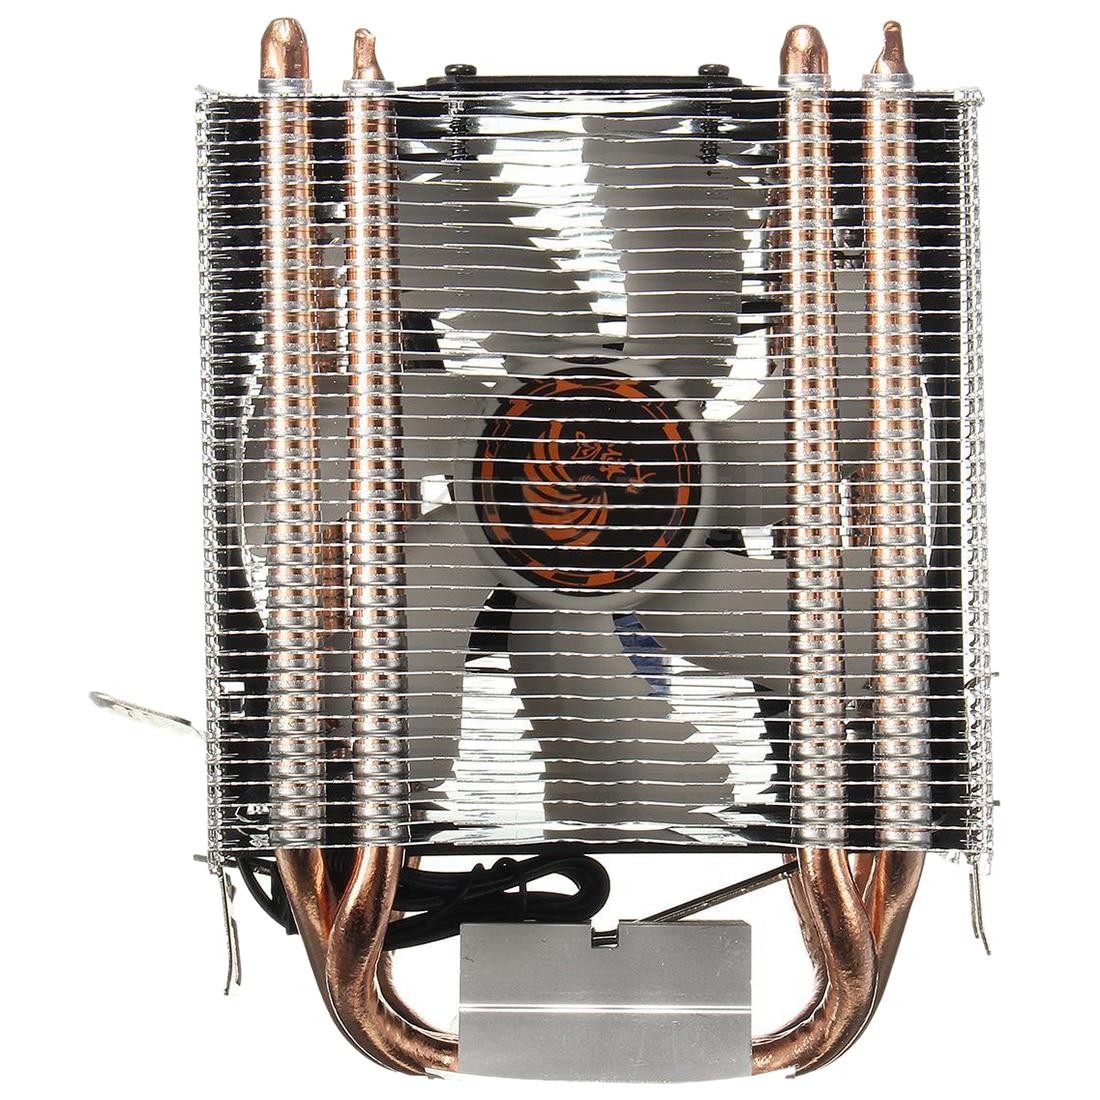 все цены на New 4 Heatpipe CPU Cooler Heat Sink for Intel LGA 1150 1151 1155 775 1156 (FOR AMD)